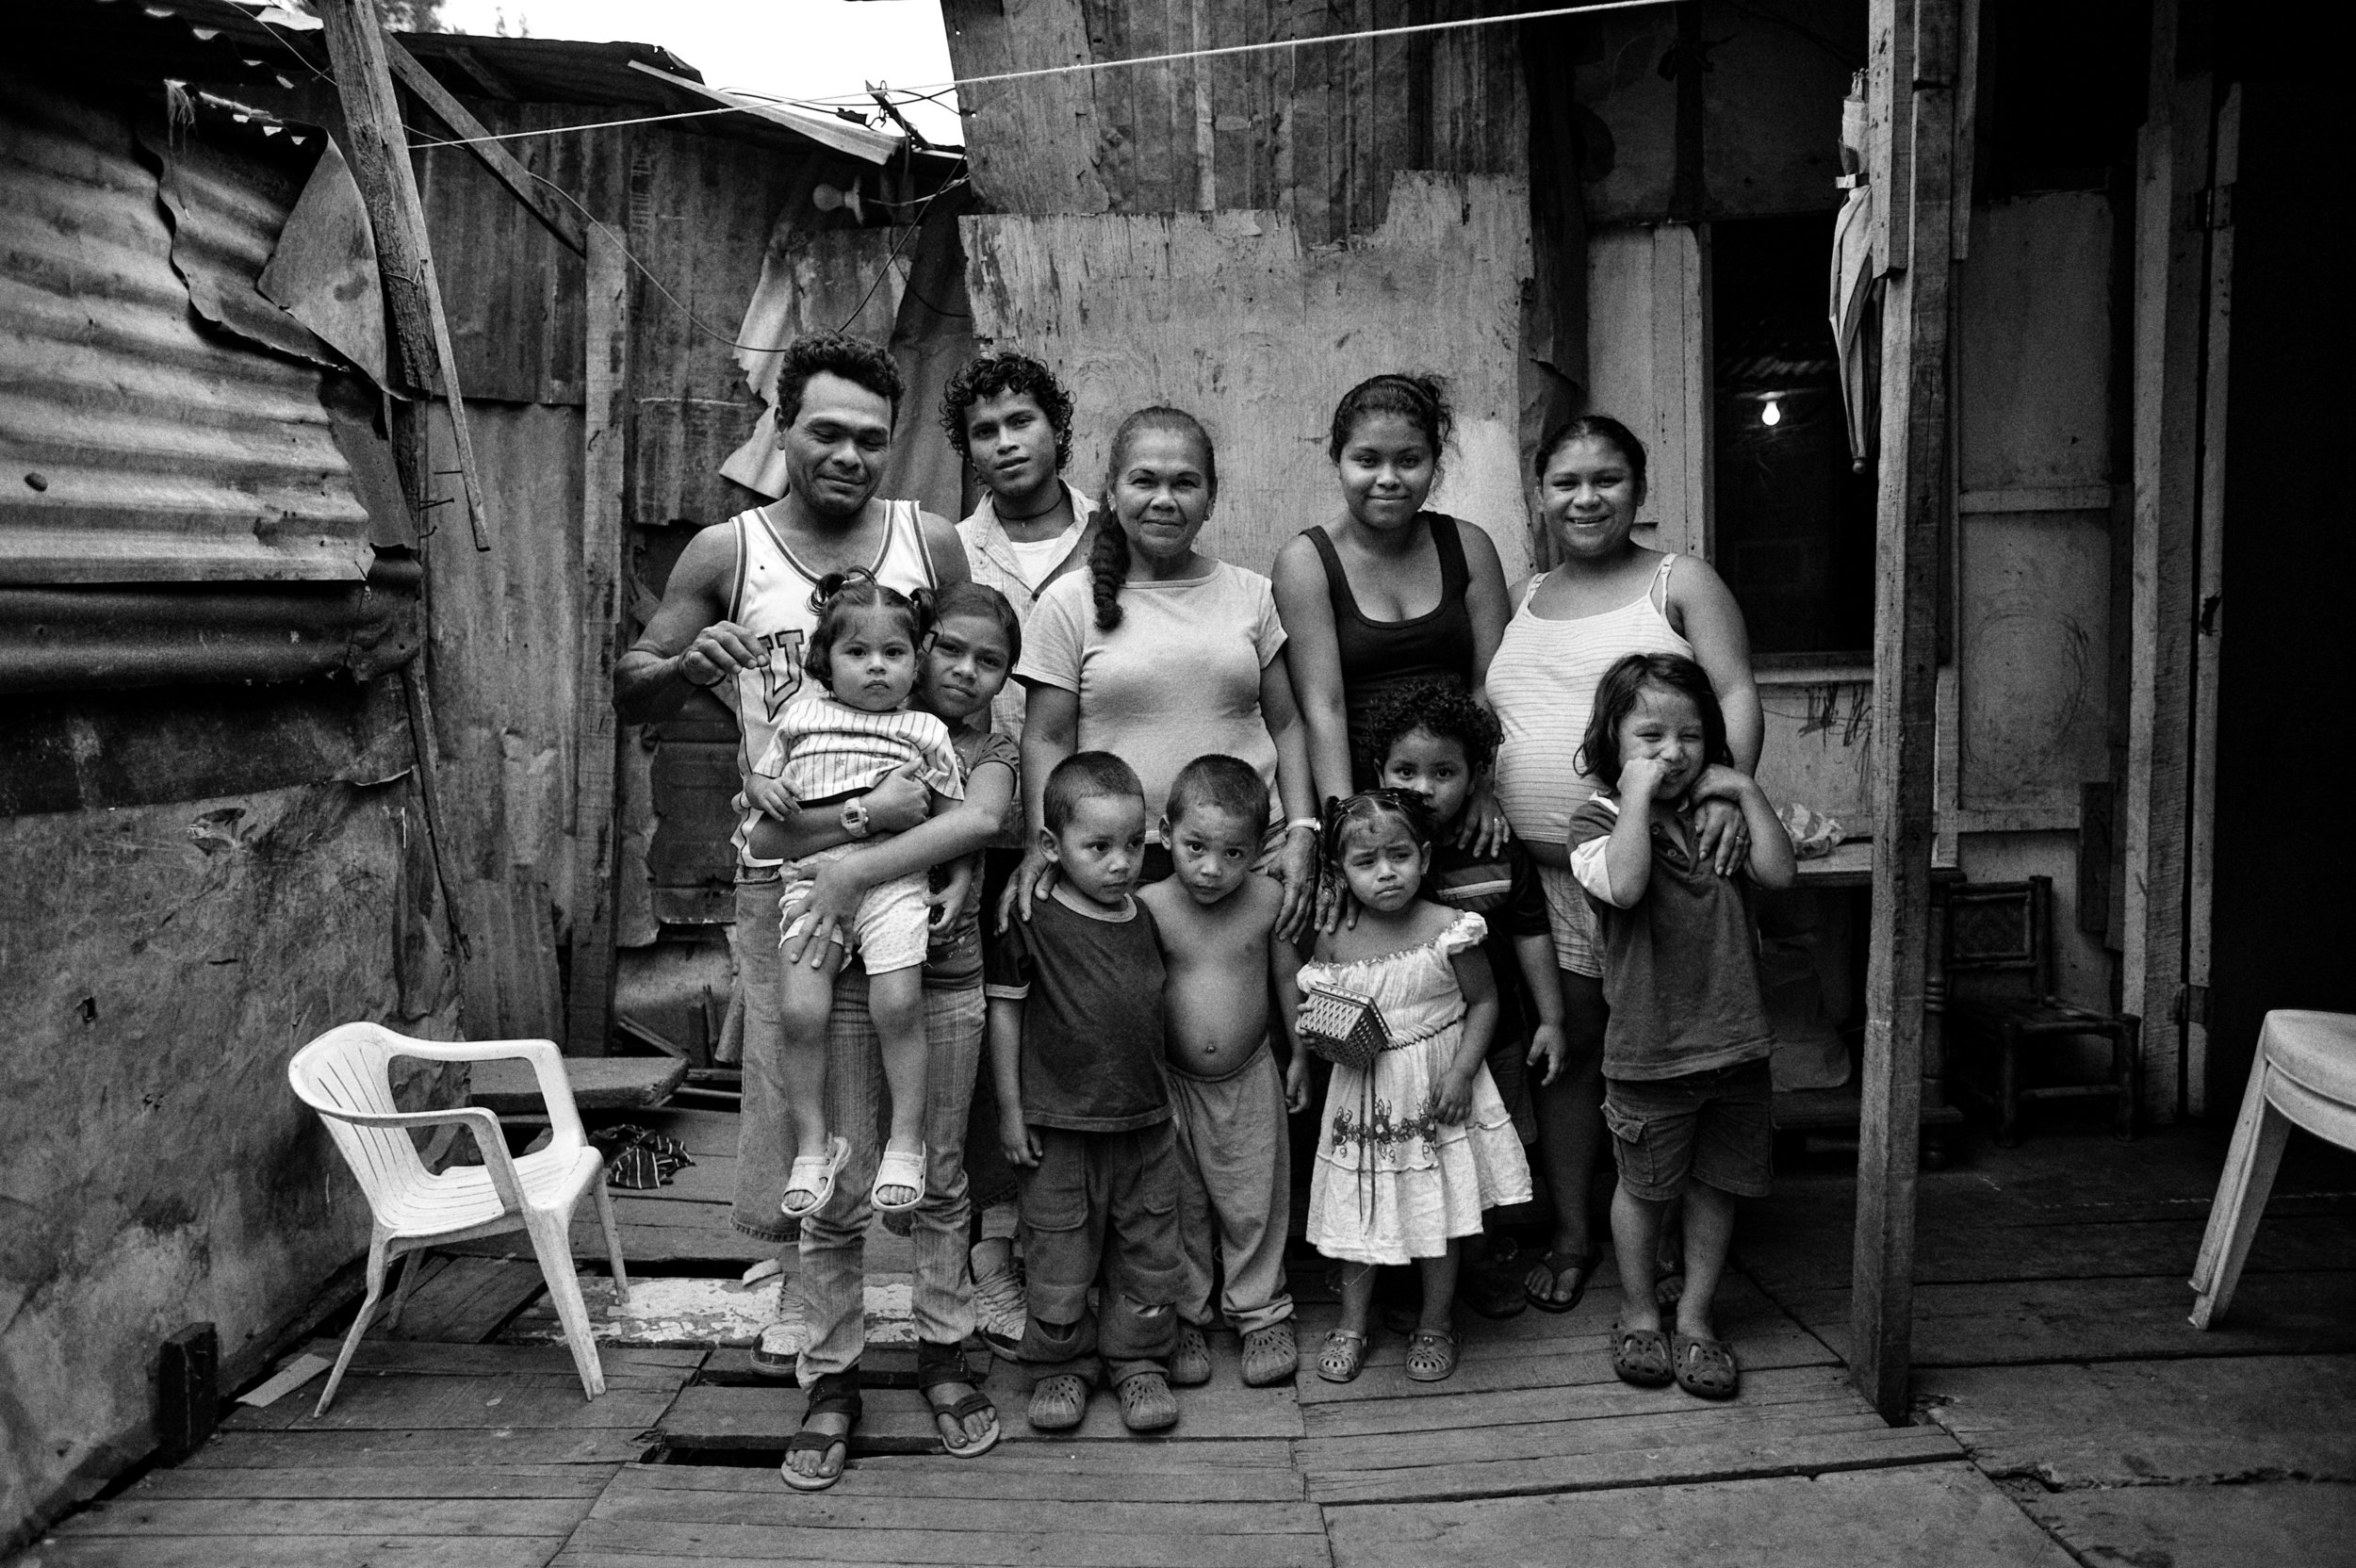 Via Panam, migration in the America's, Costa Rica